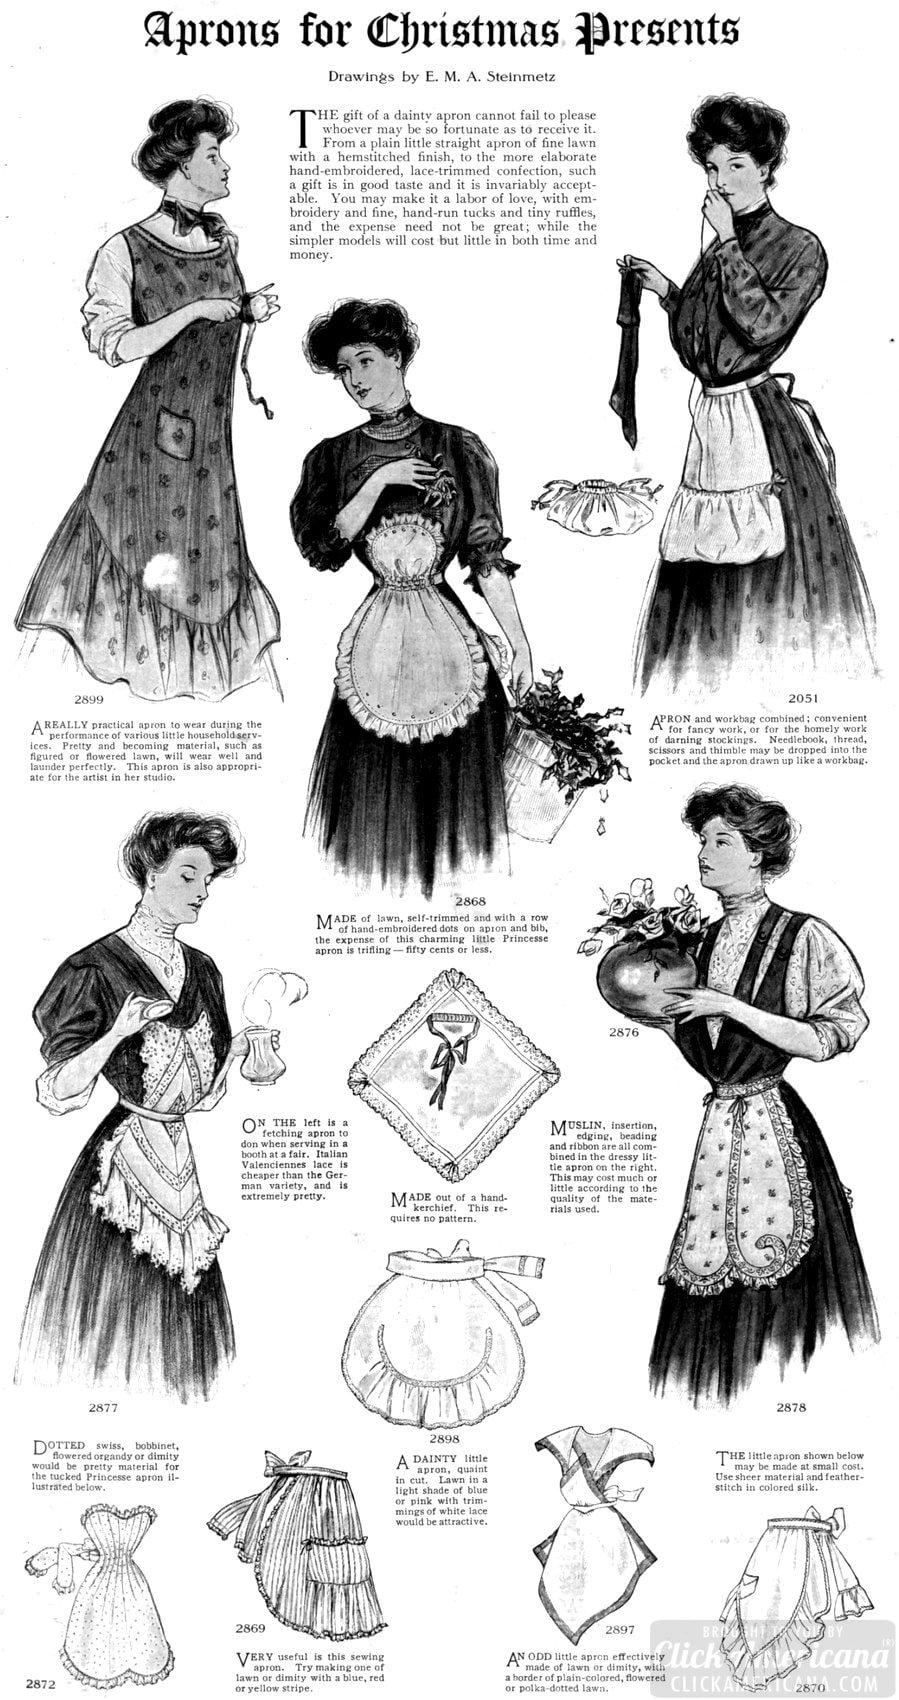 Aprons for Christmas presents 1906